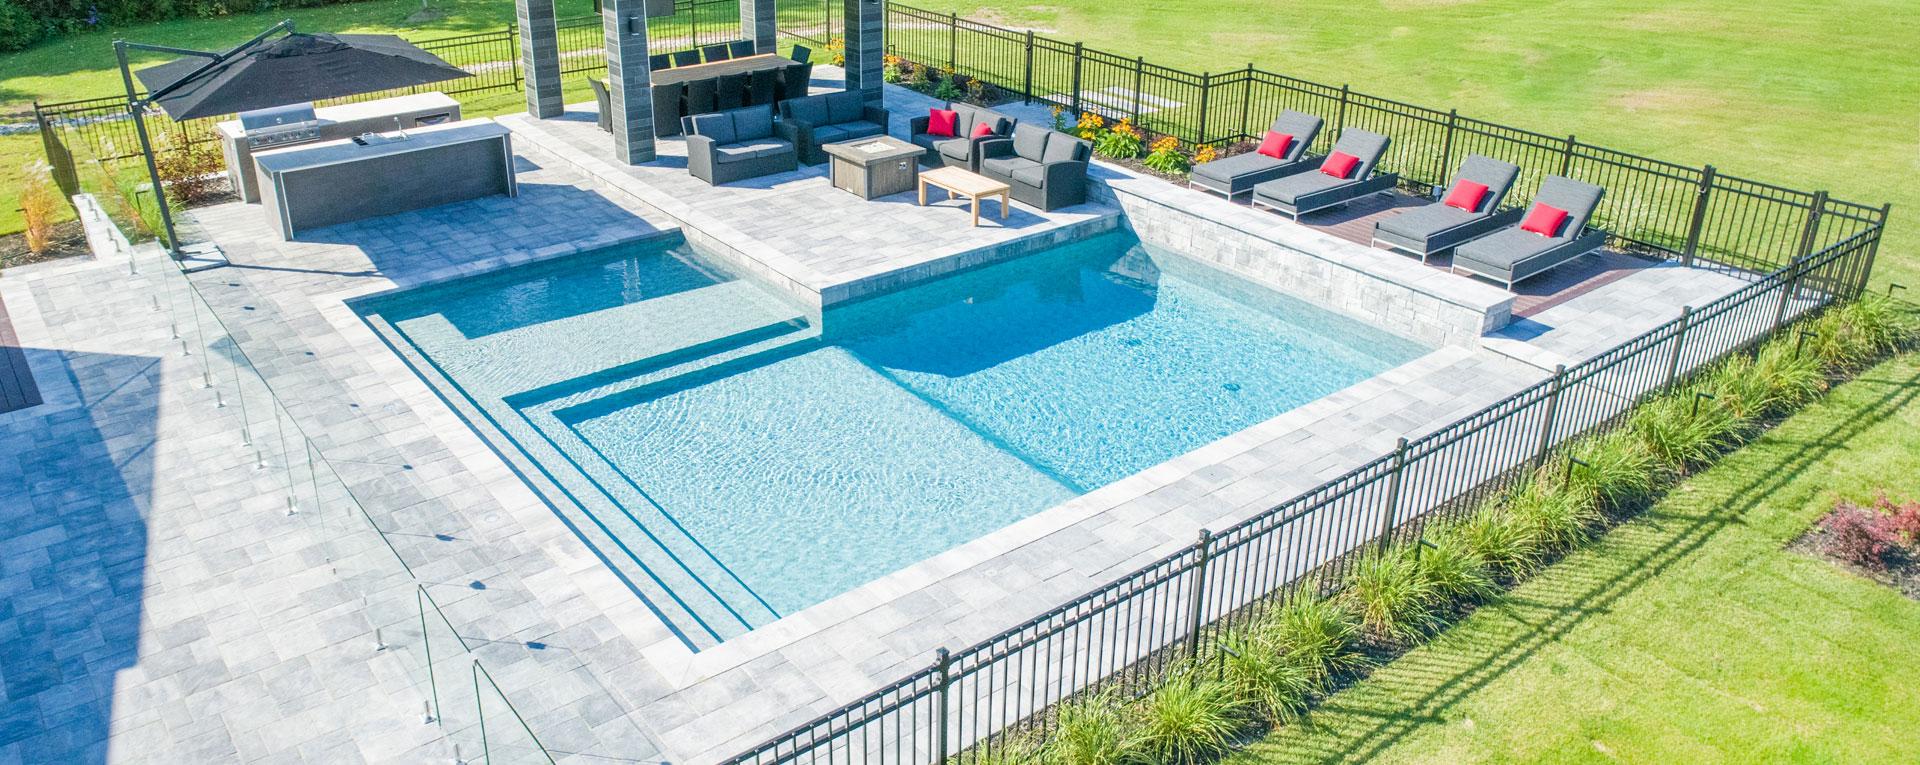 Piscine creus e et installation laval montr al piscine for Ouverture piscine